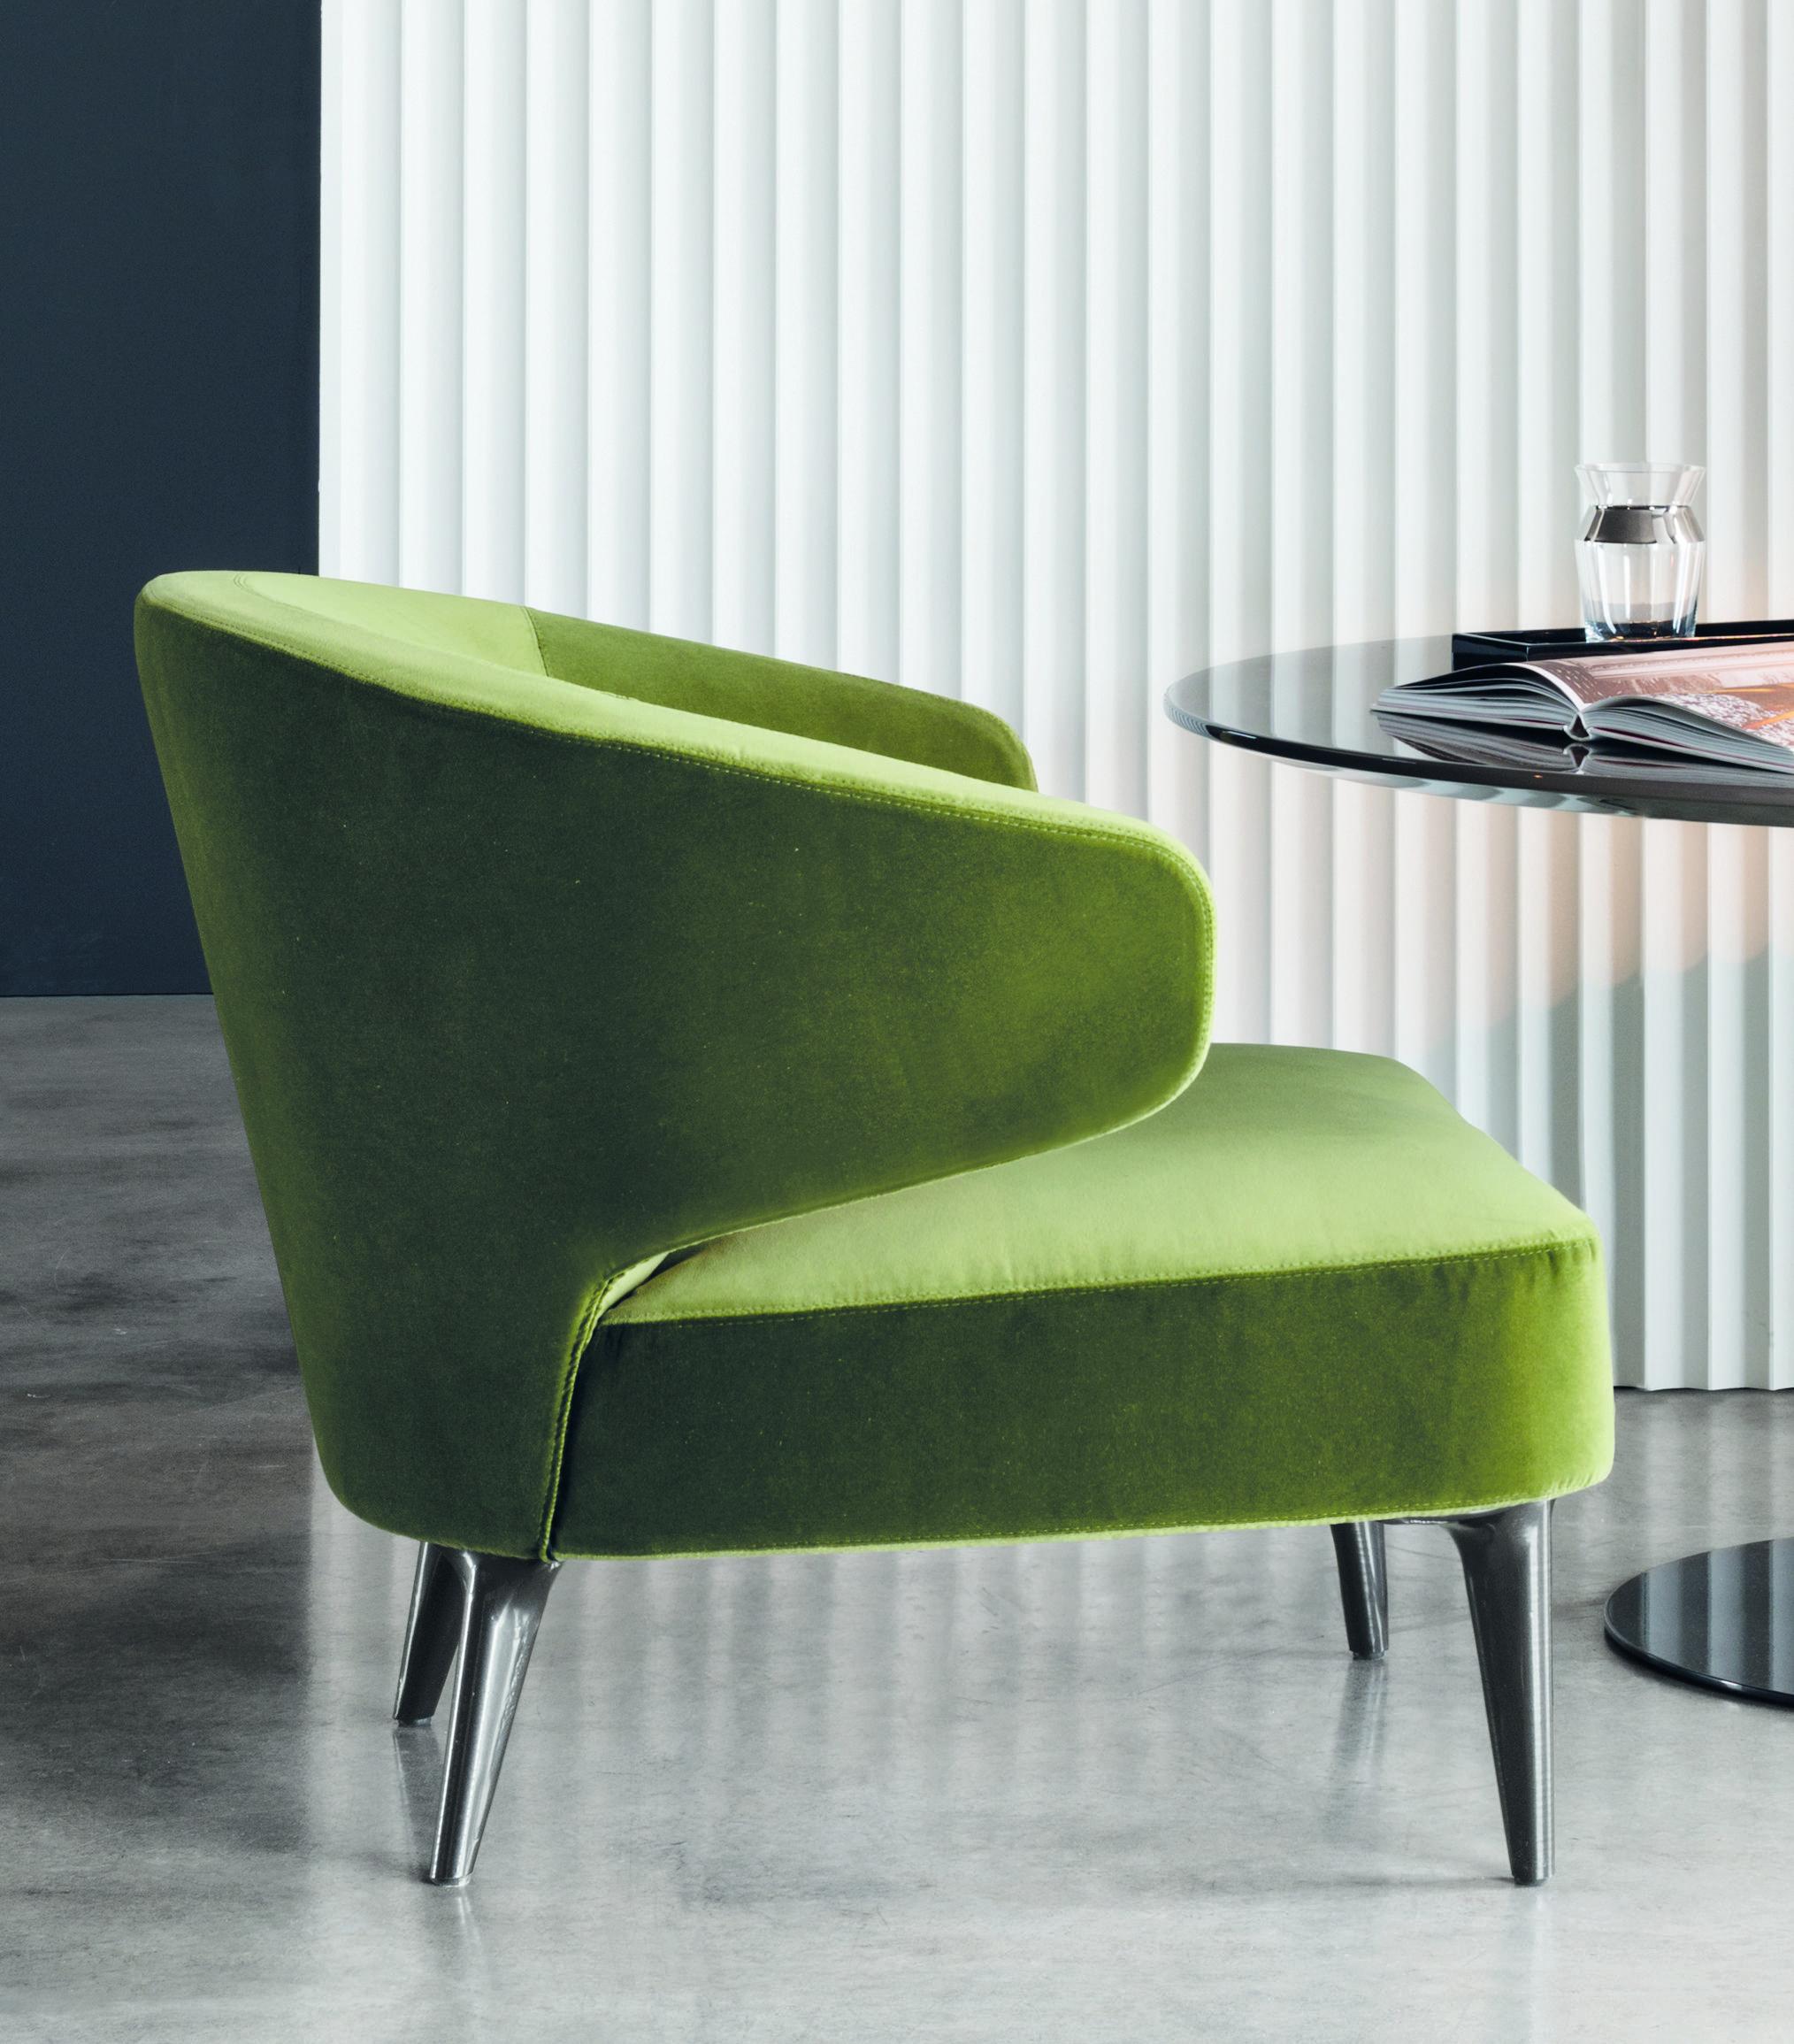 Sessel aston von minotti furniture for Sofa industriedesign